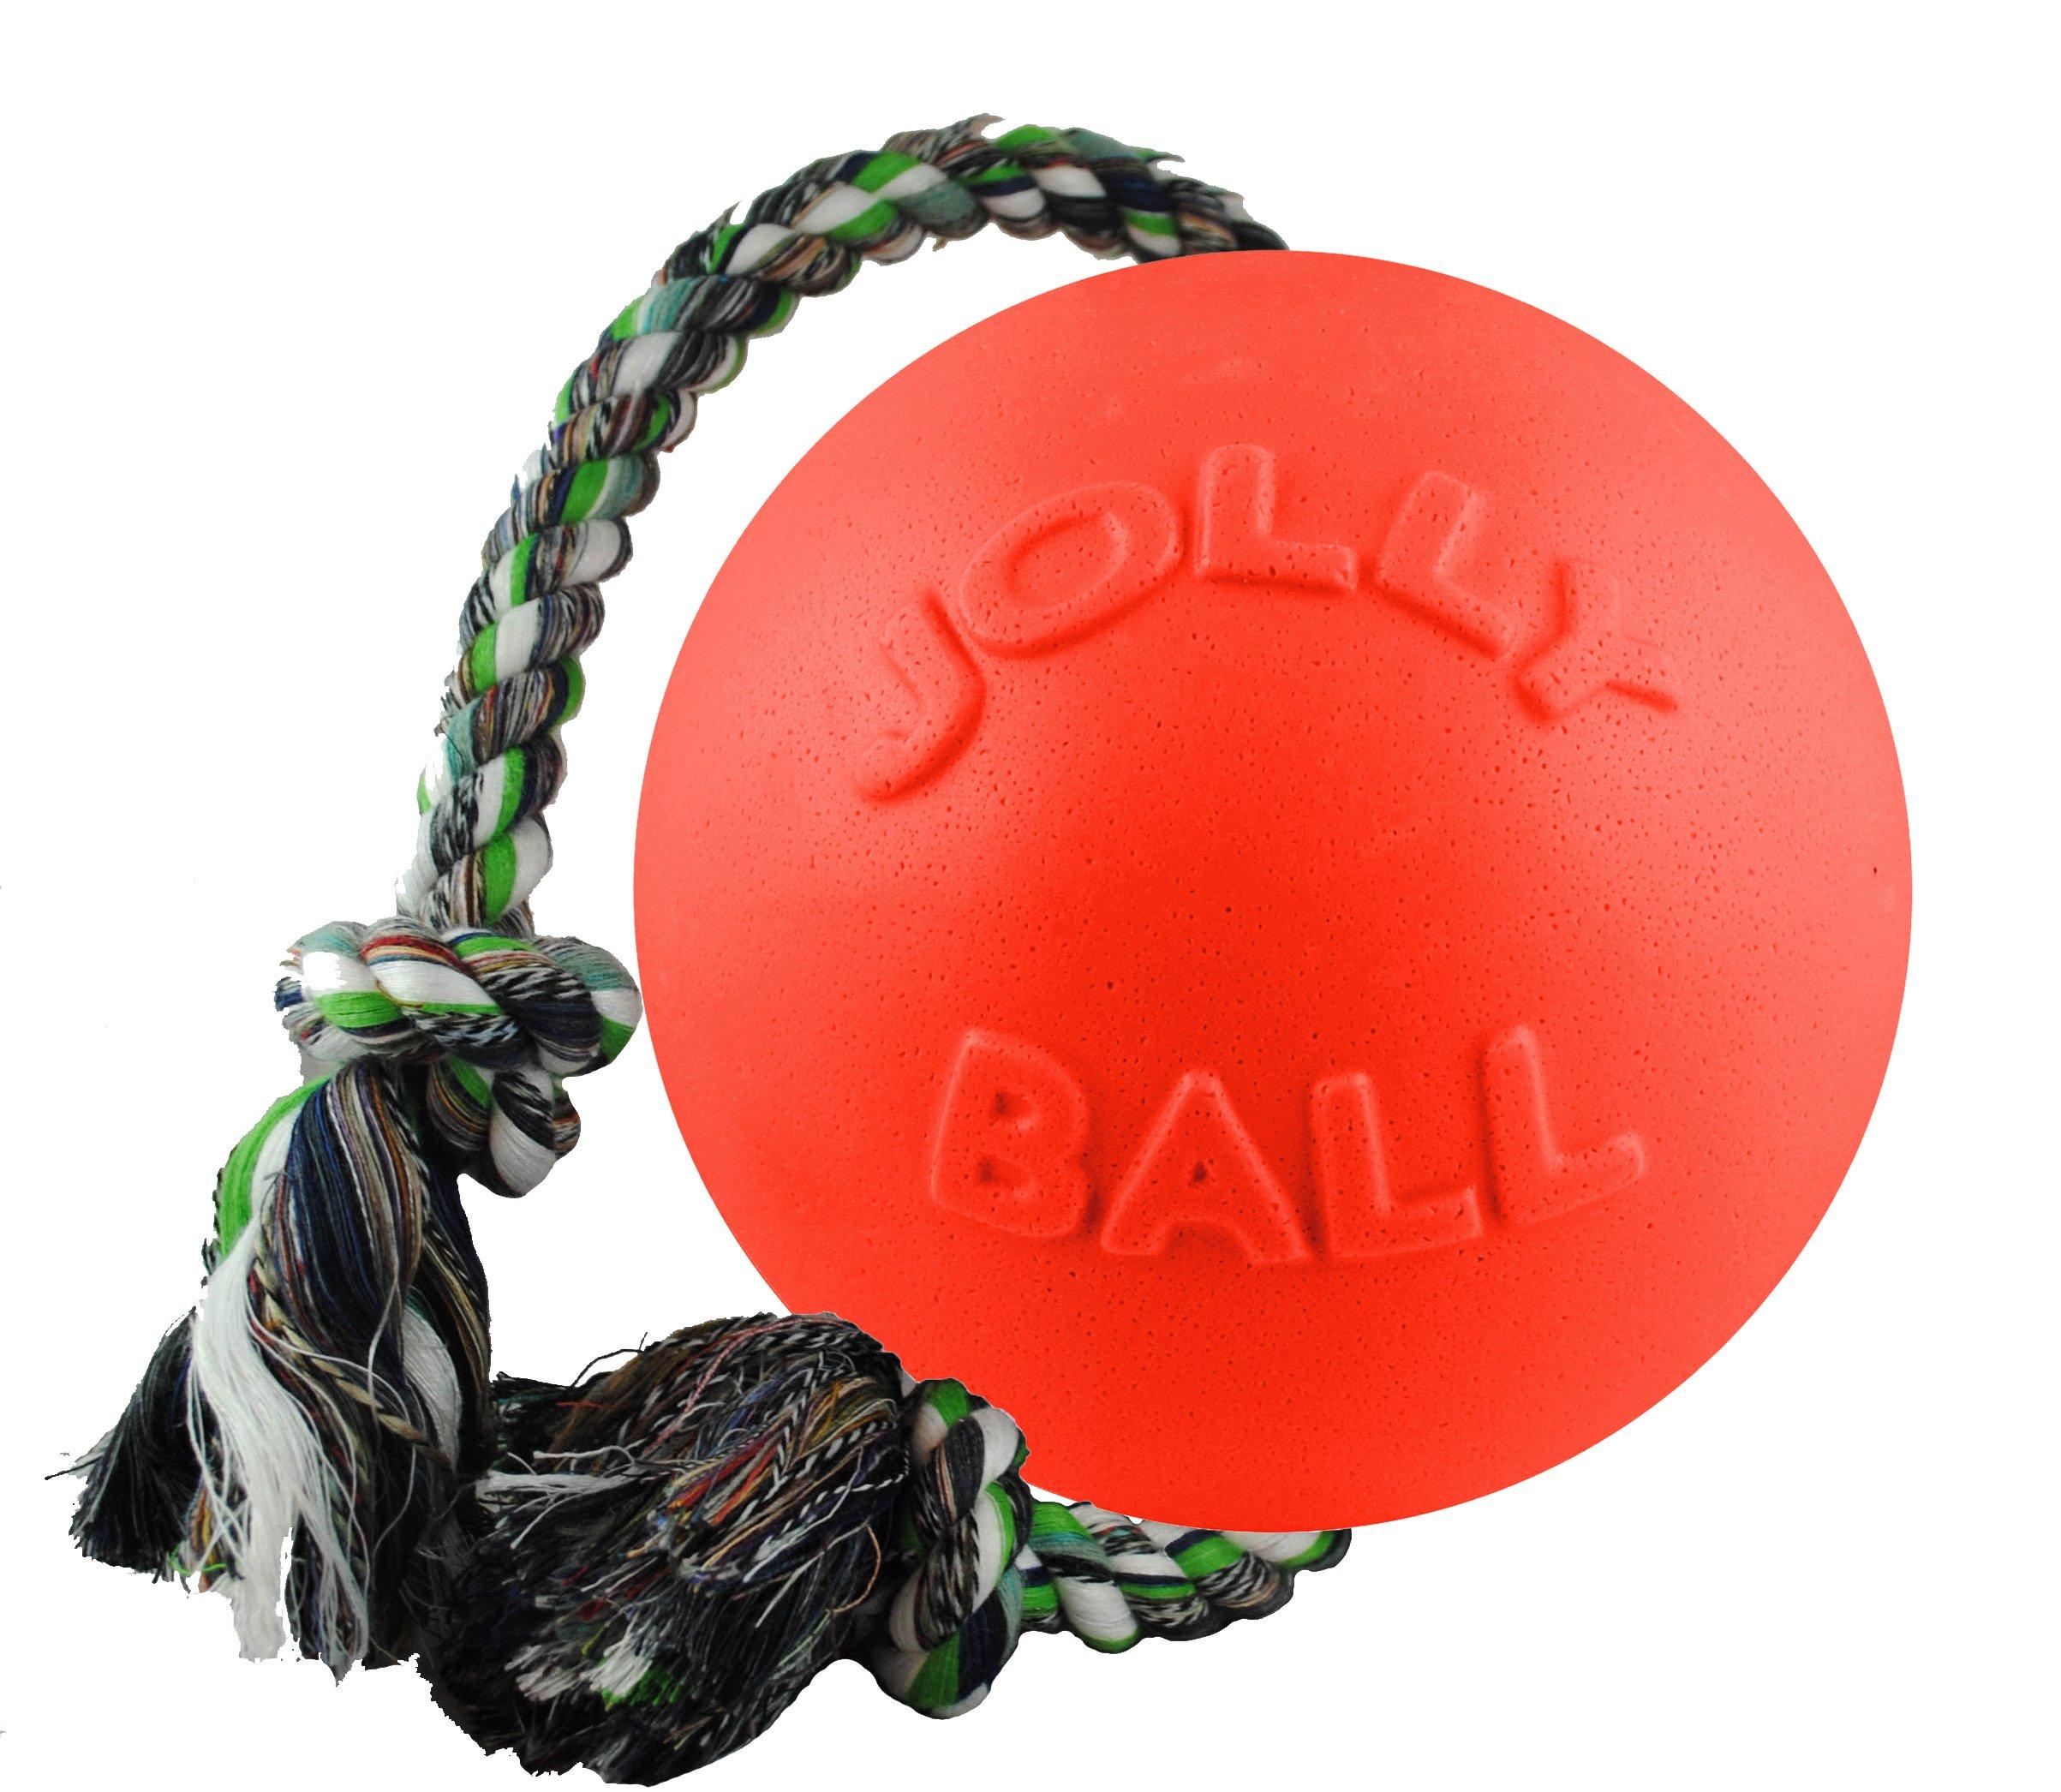 Jolly Pets 6'' Romp-n-Roll Dog Toy, Medium, Orange